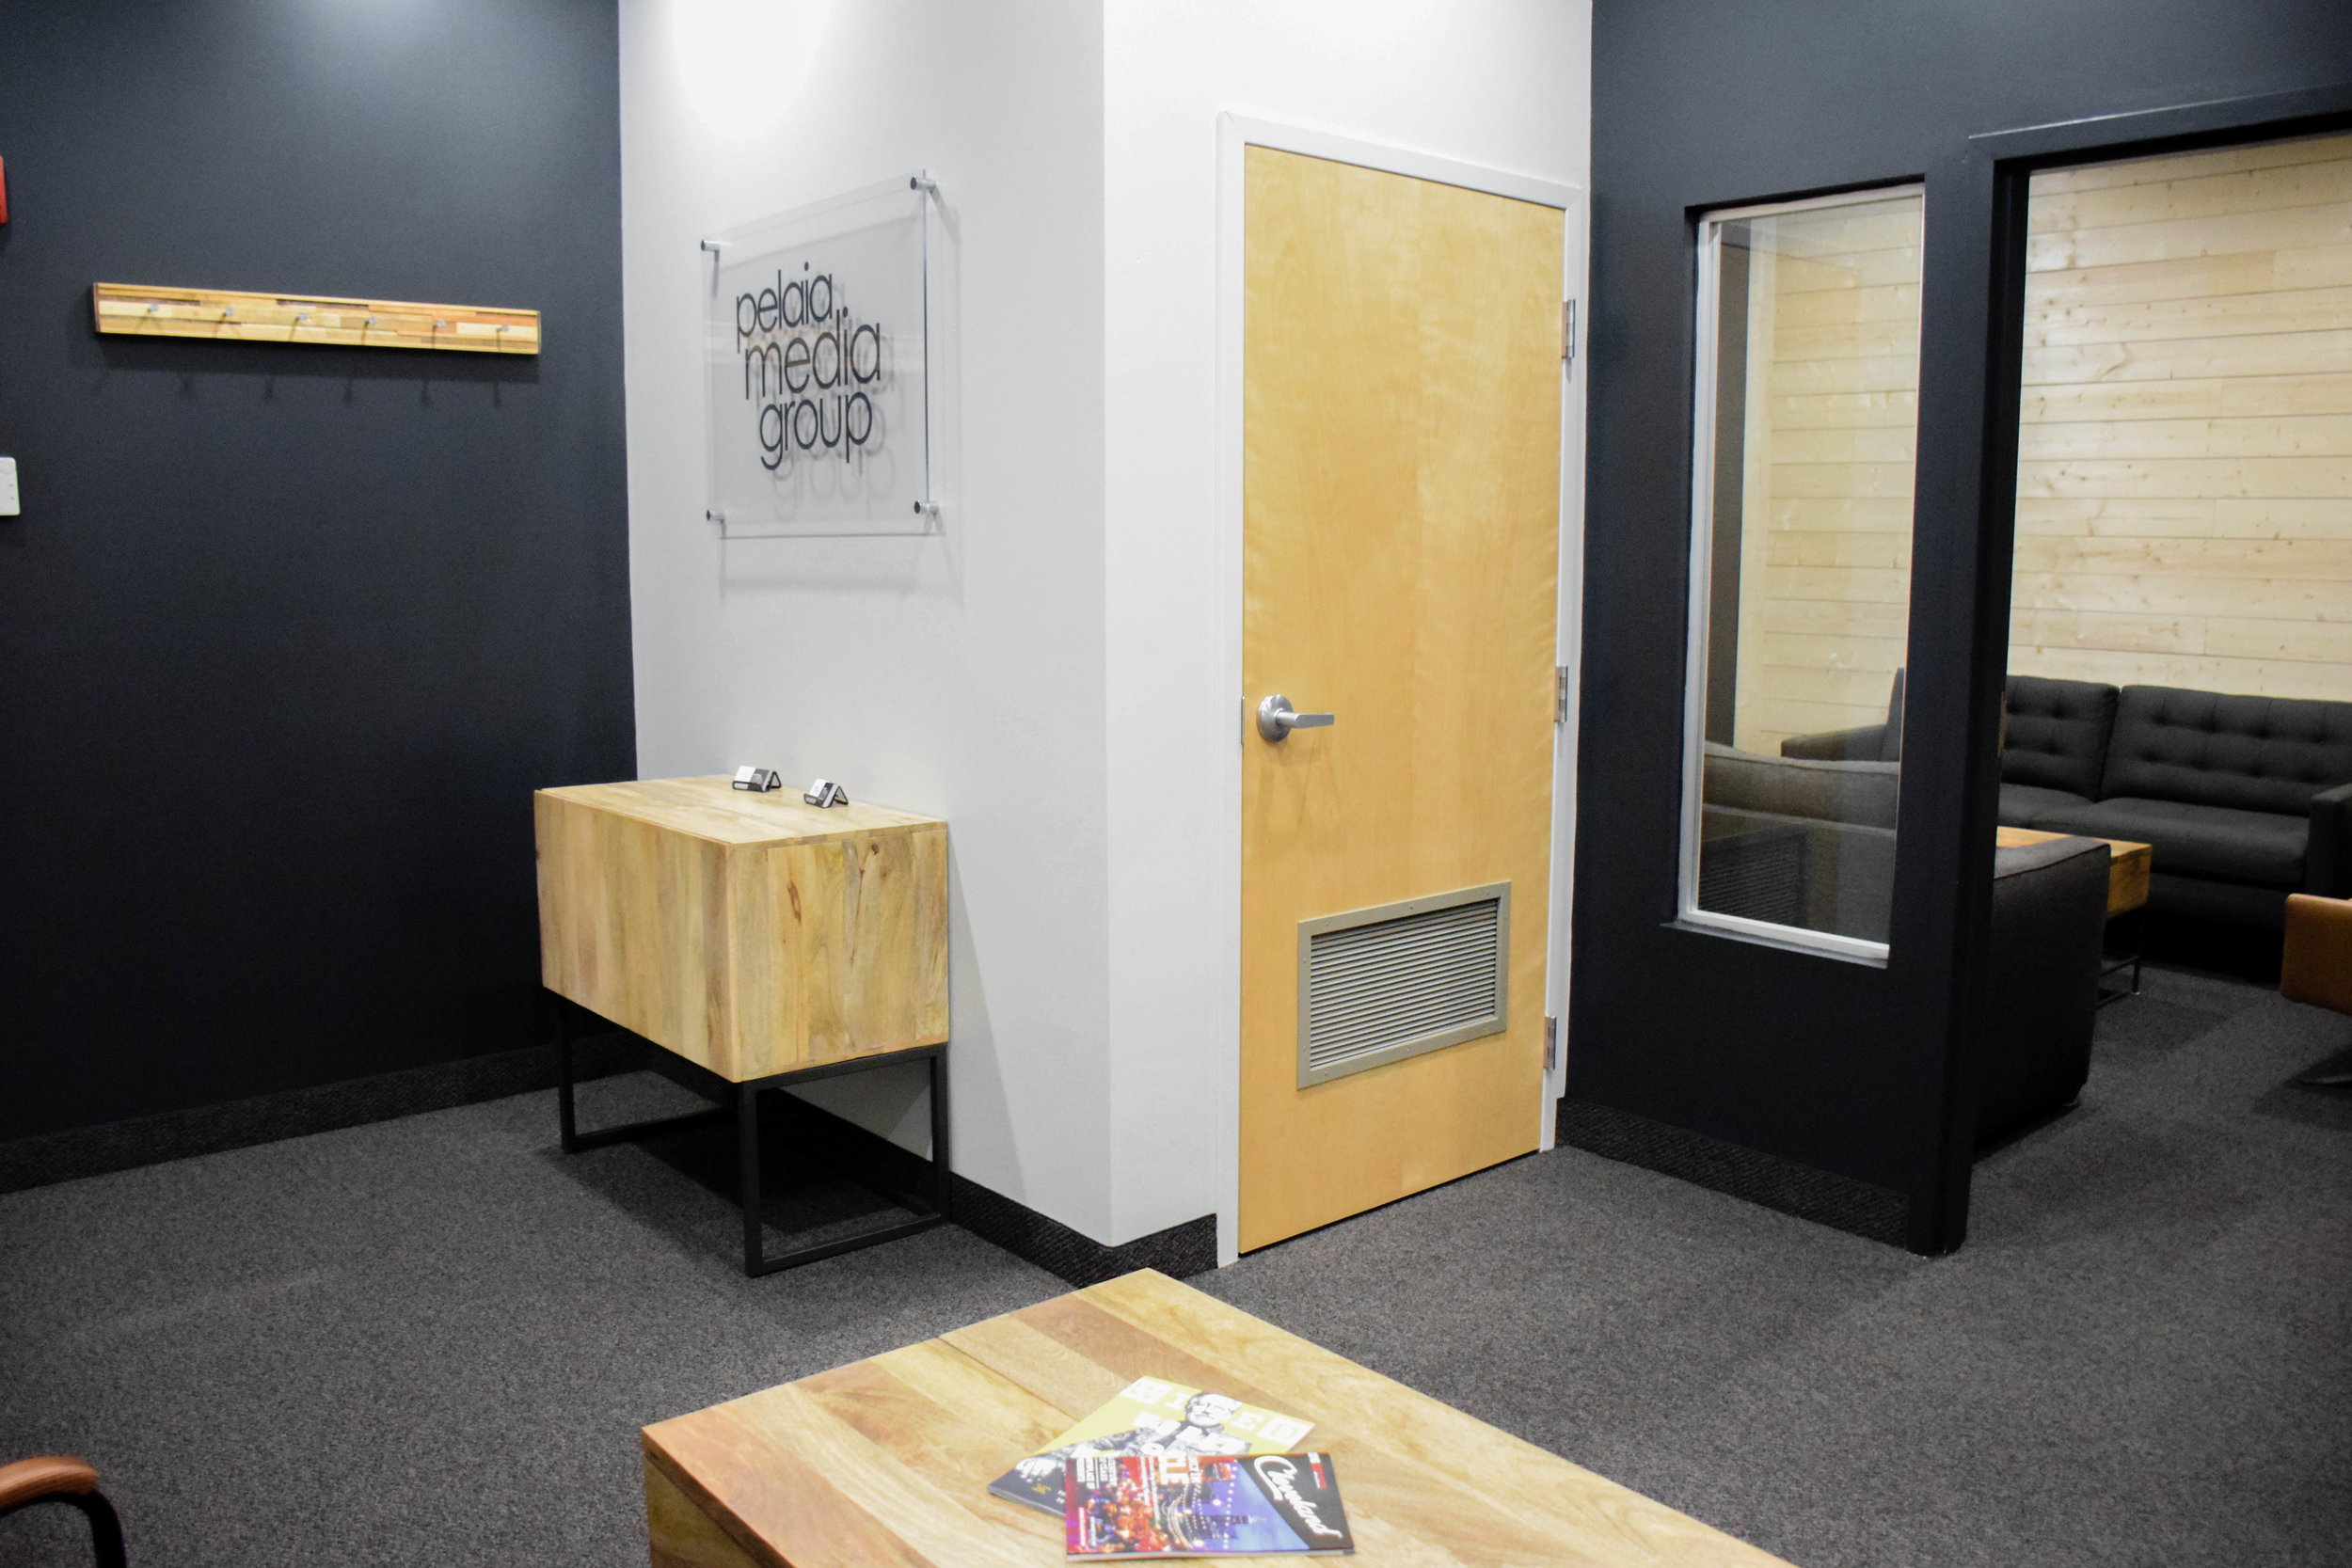 industrial workspace design | pelaia media group-0737-3.jpg